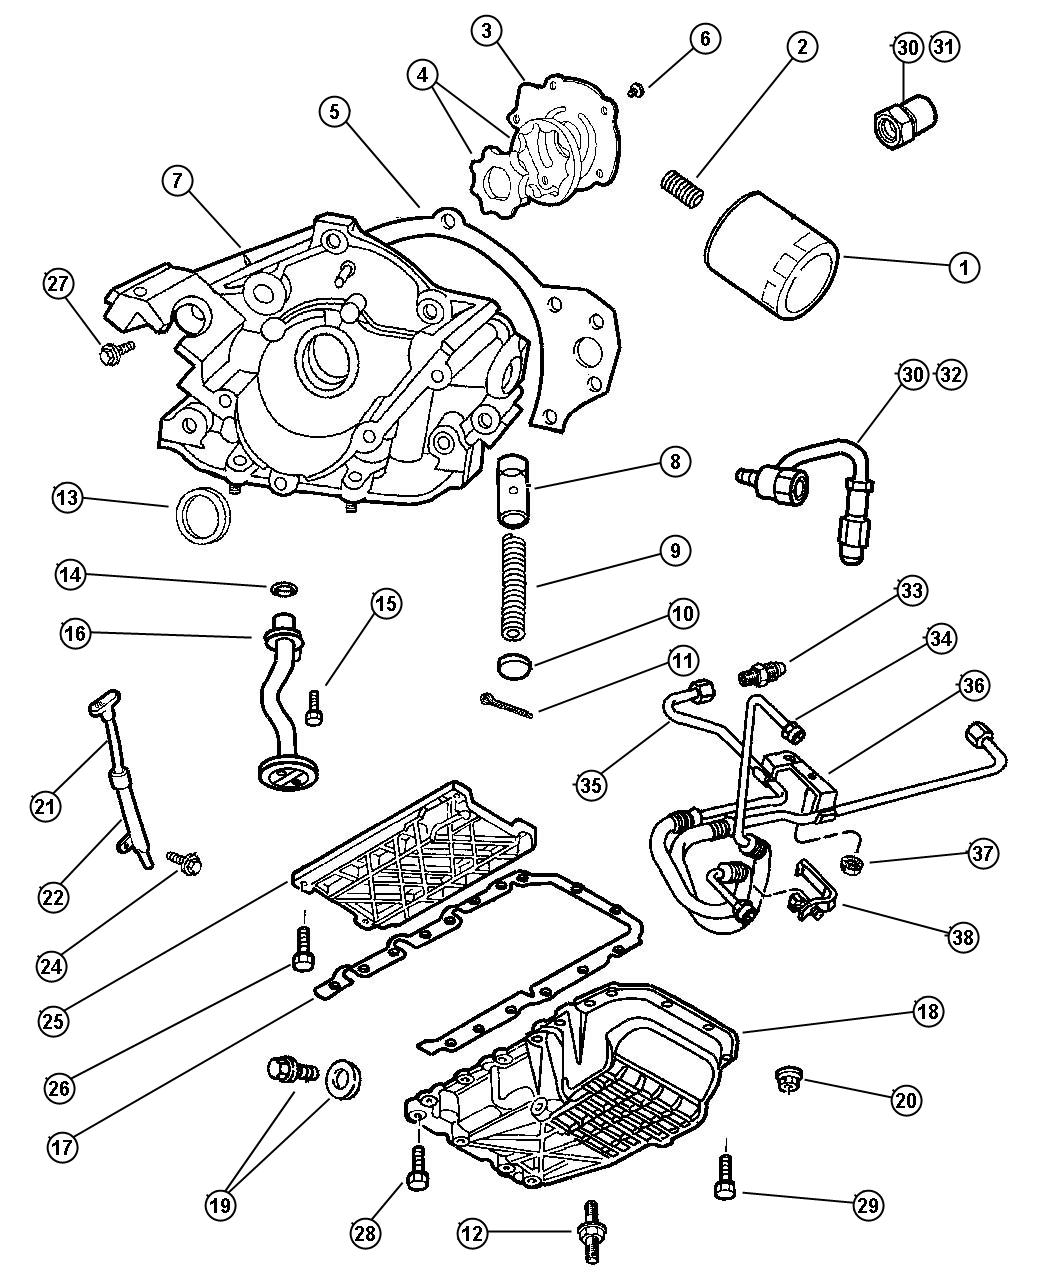 Chrysler Lhs Engine Oiling 3 5l Engine